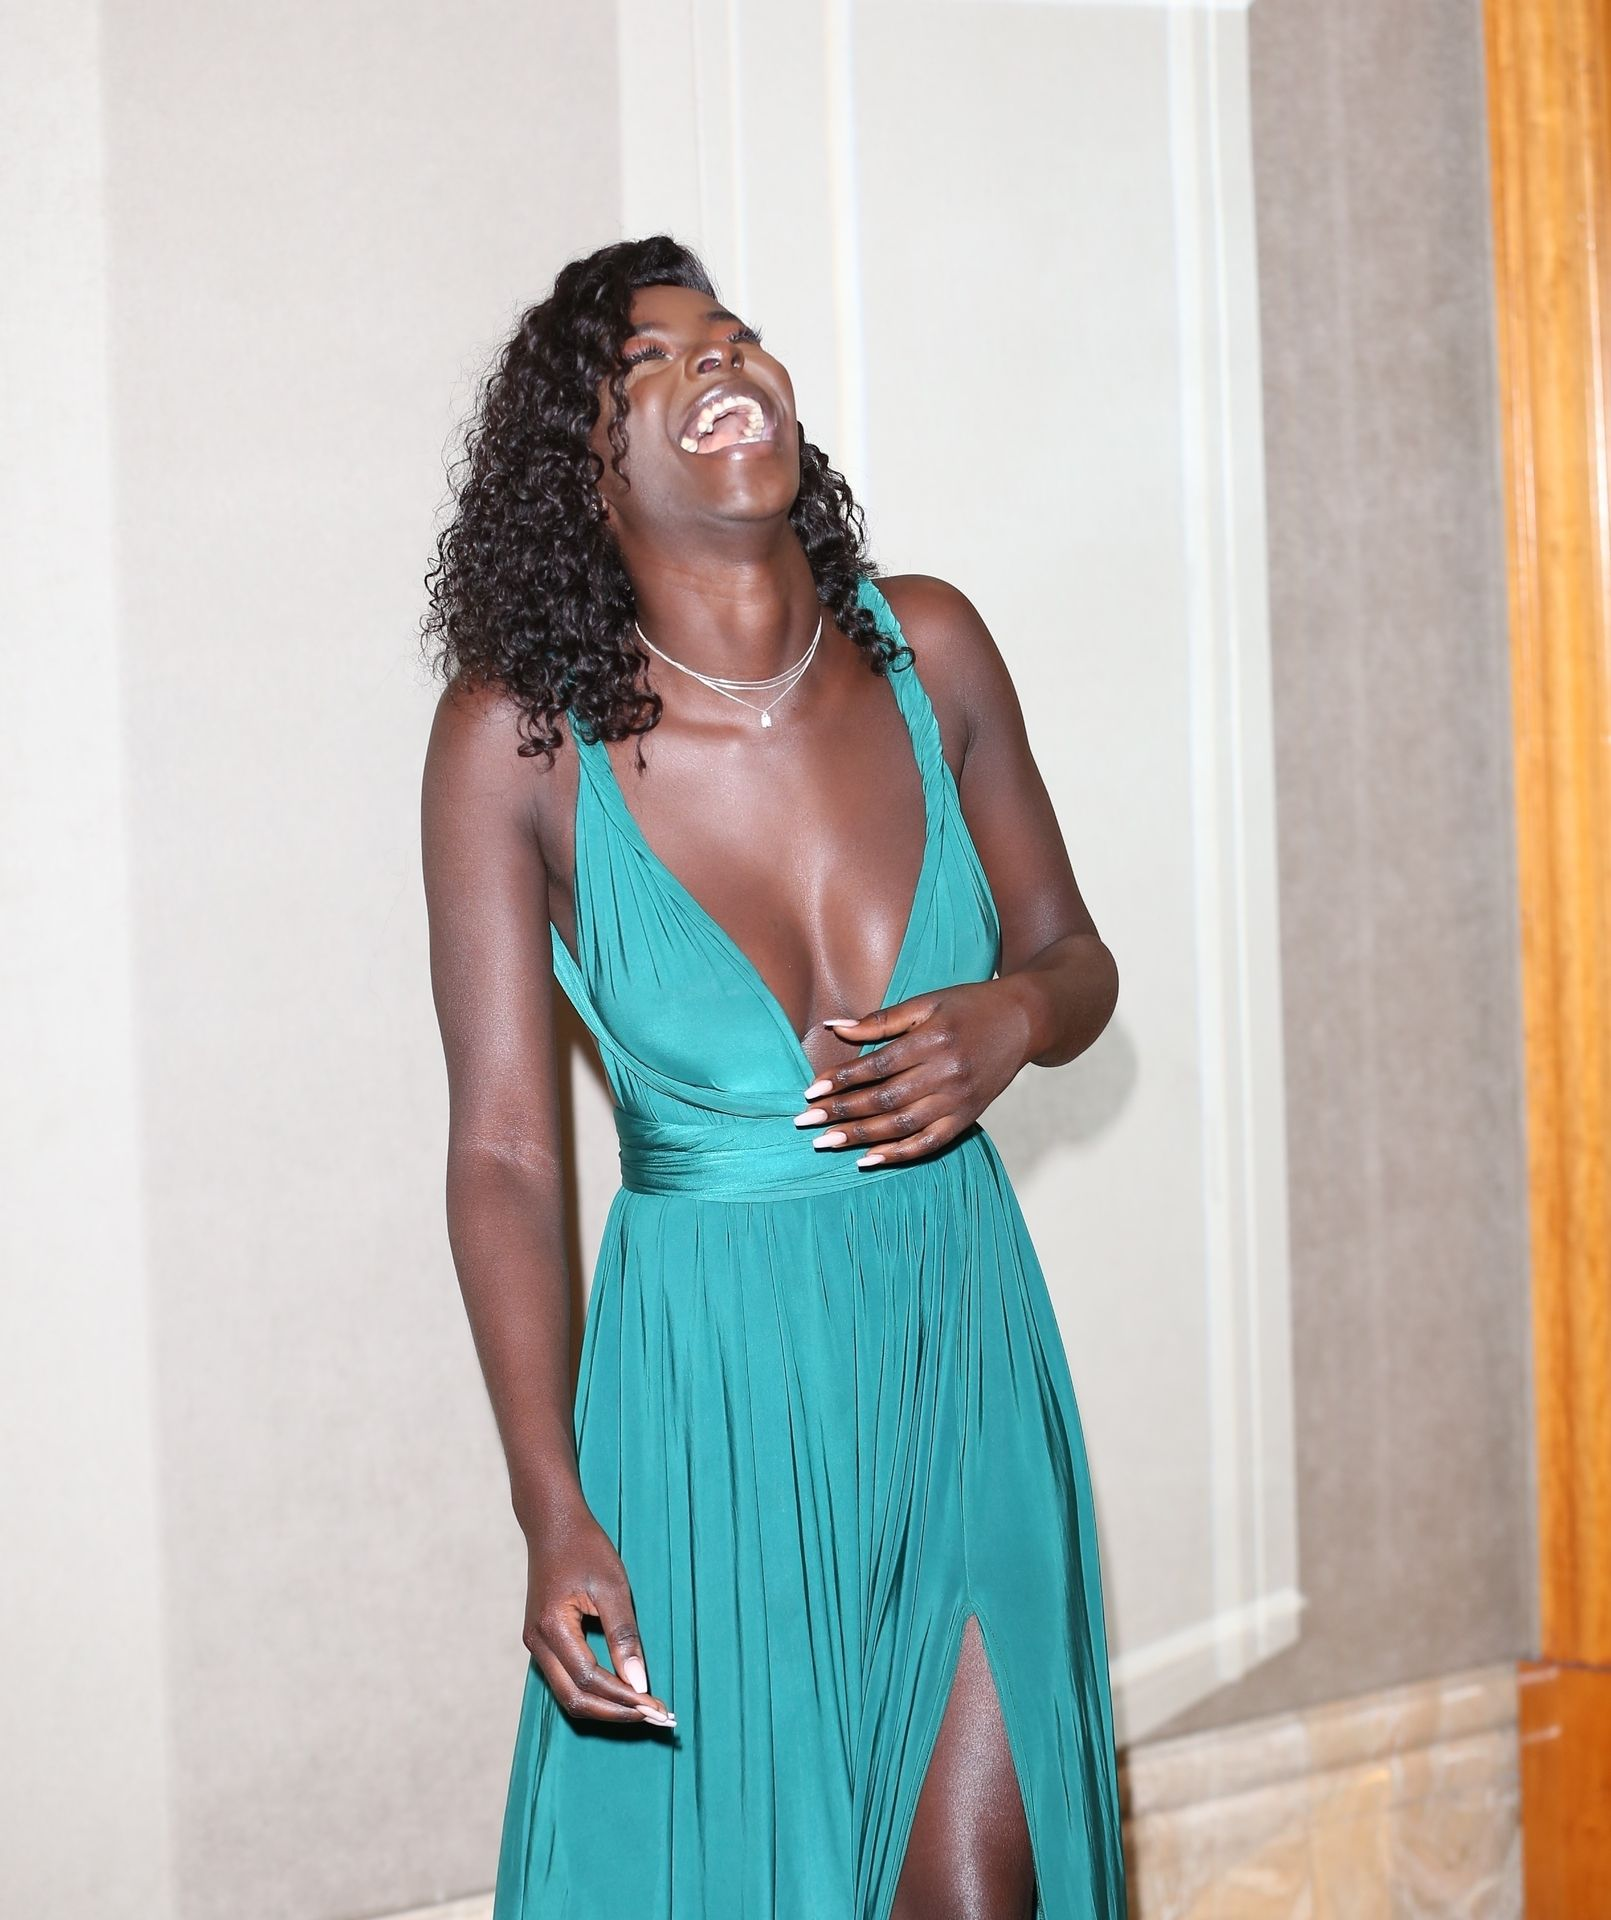 Mike Boateng & Priscilla Anyabu Are Seen At British Ethnic Diversity Sports Awards 0163